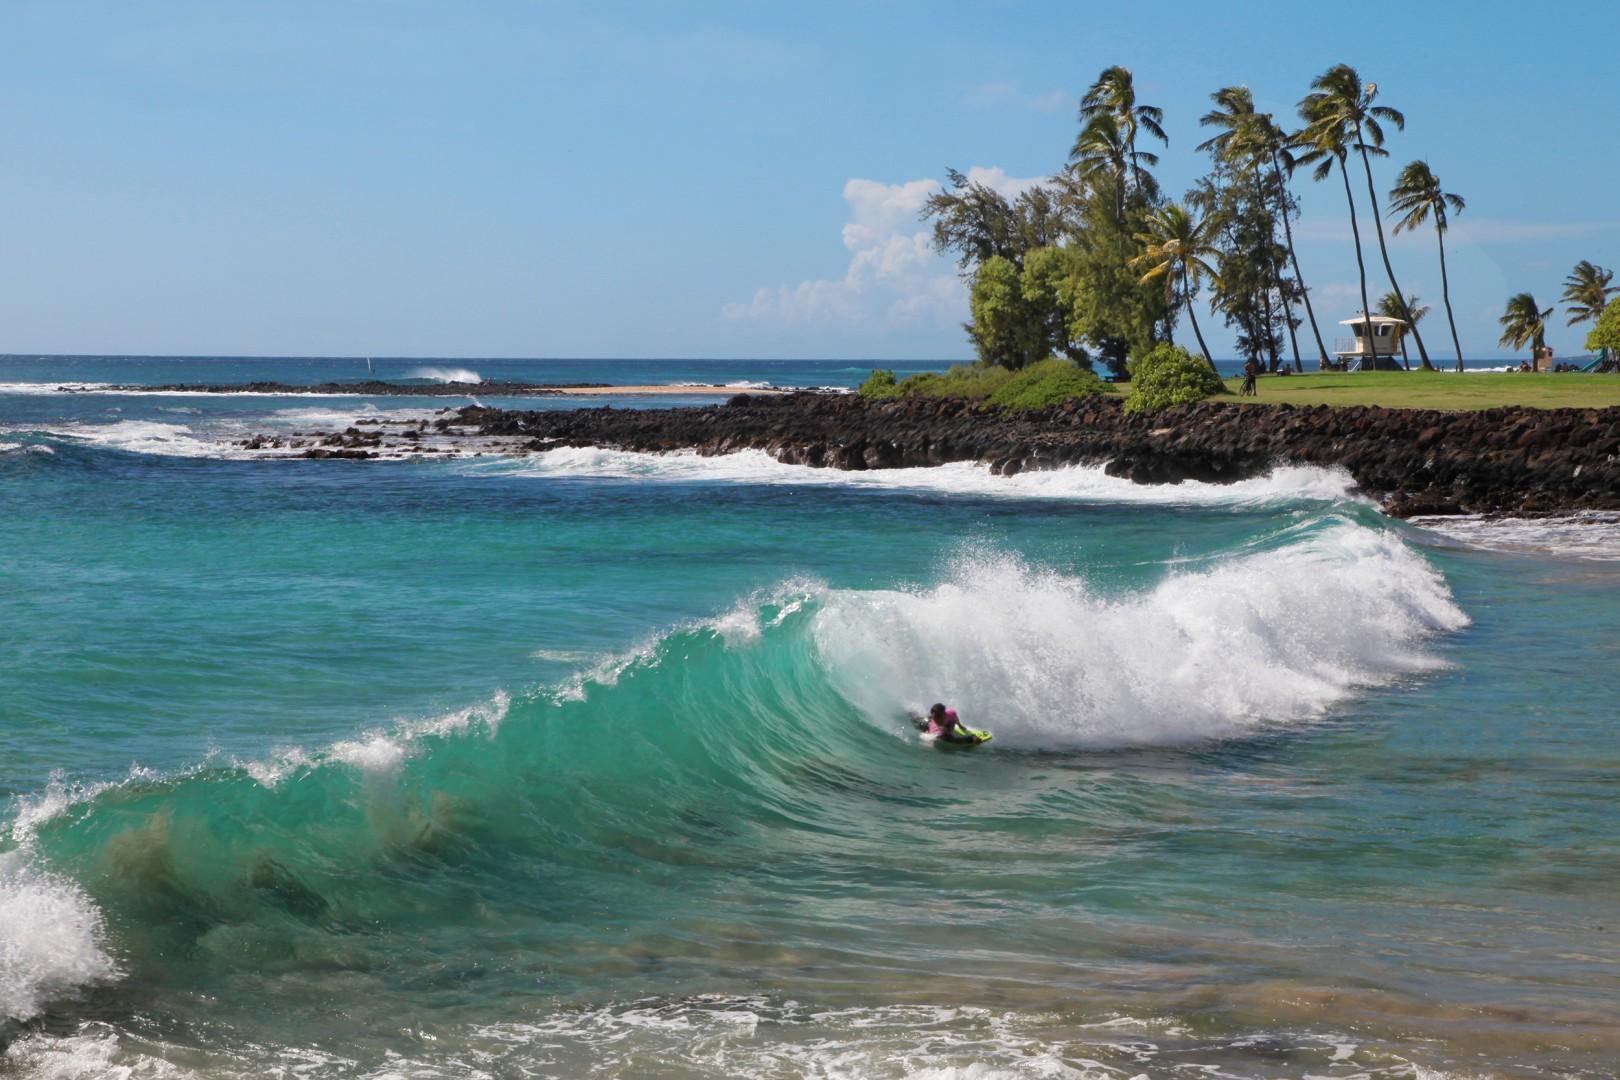 brennekes beach boarder